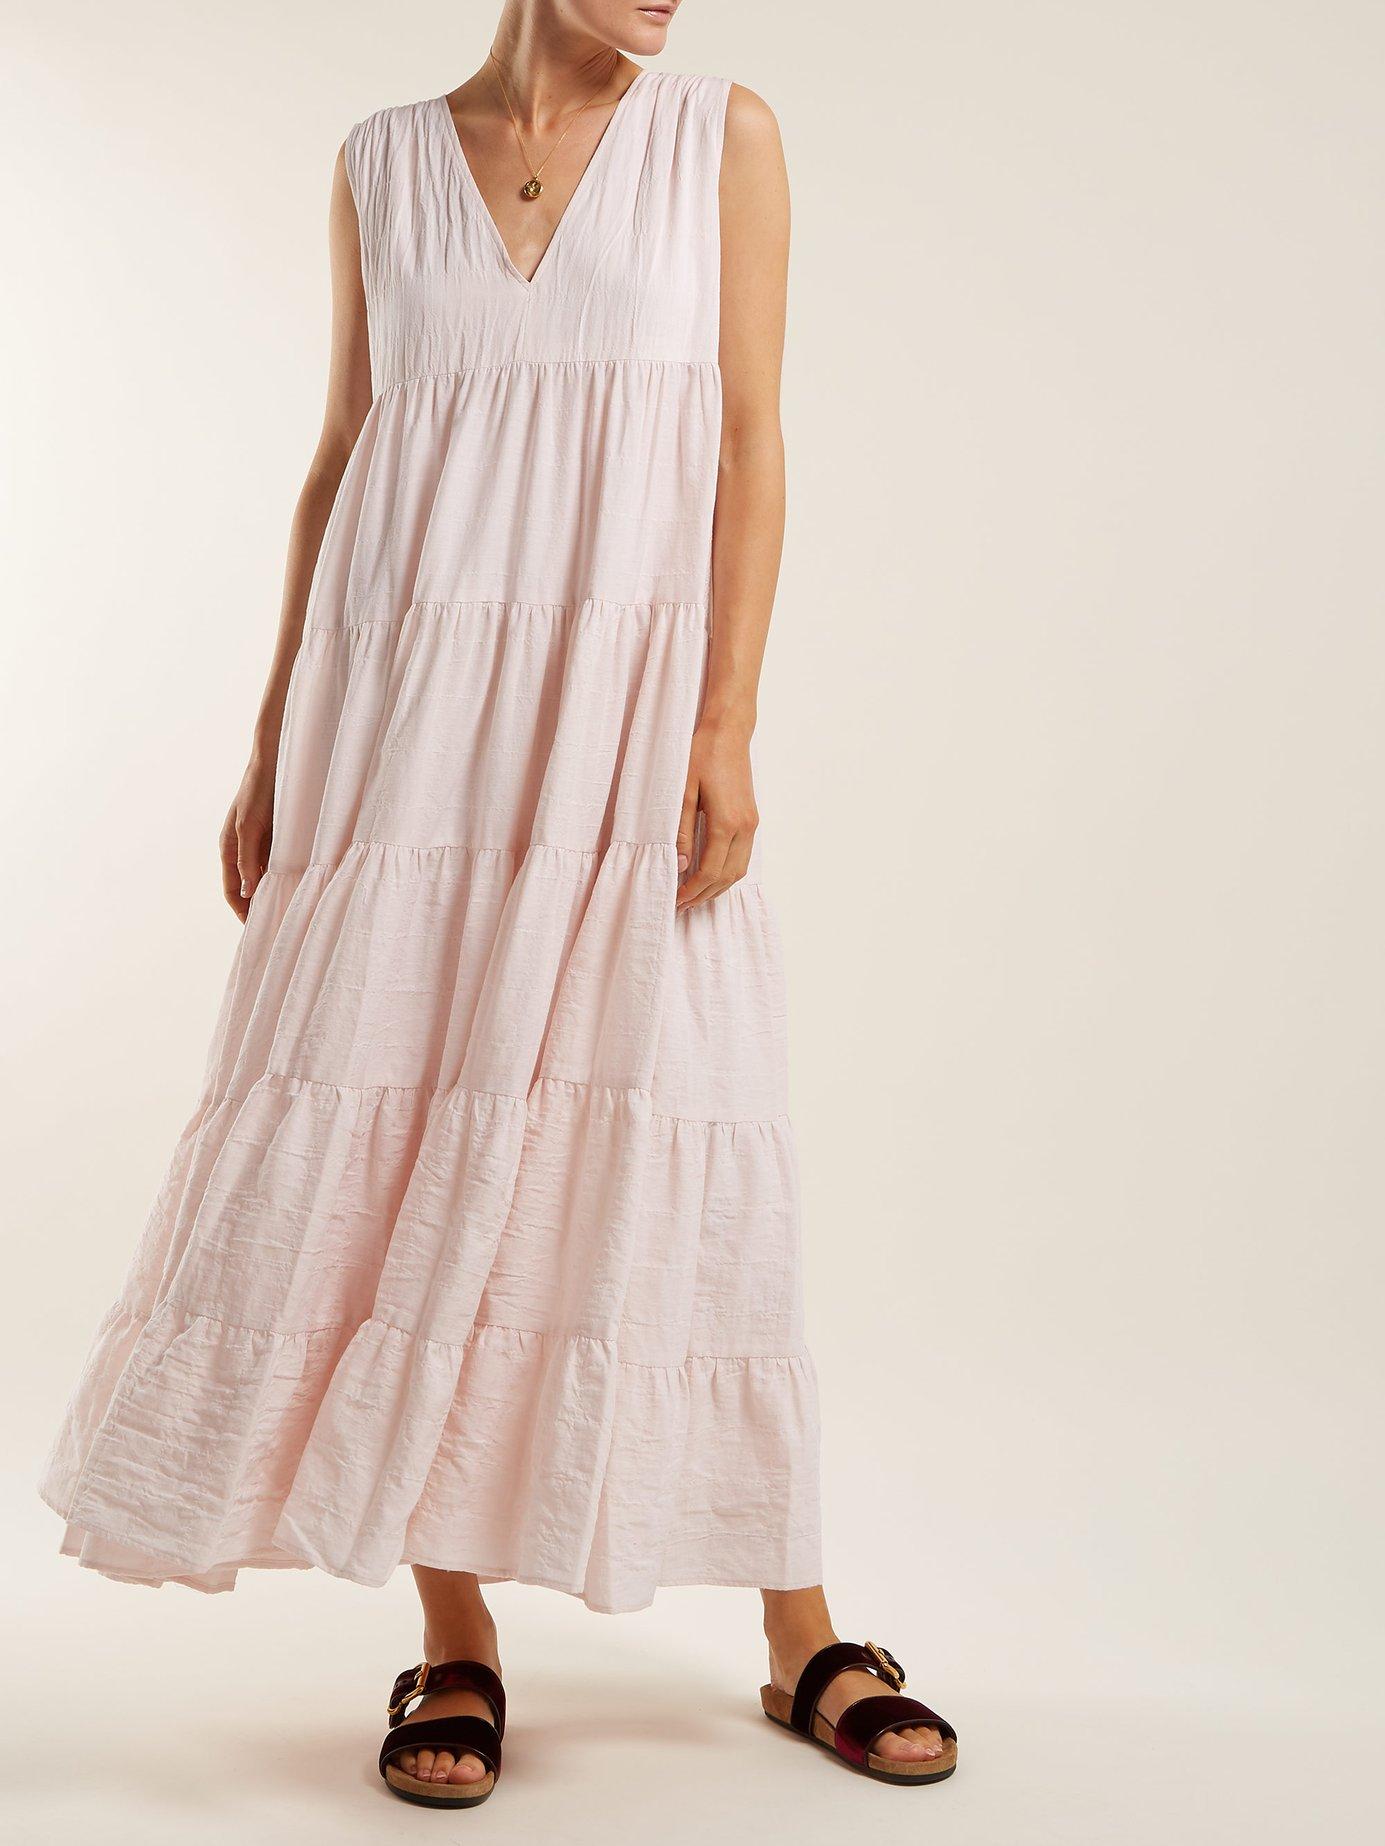 Kelmtu tiered cotton-blend dress by Merlette